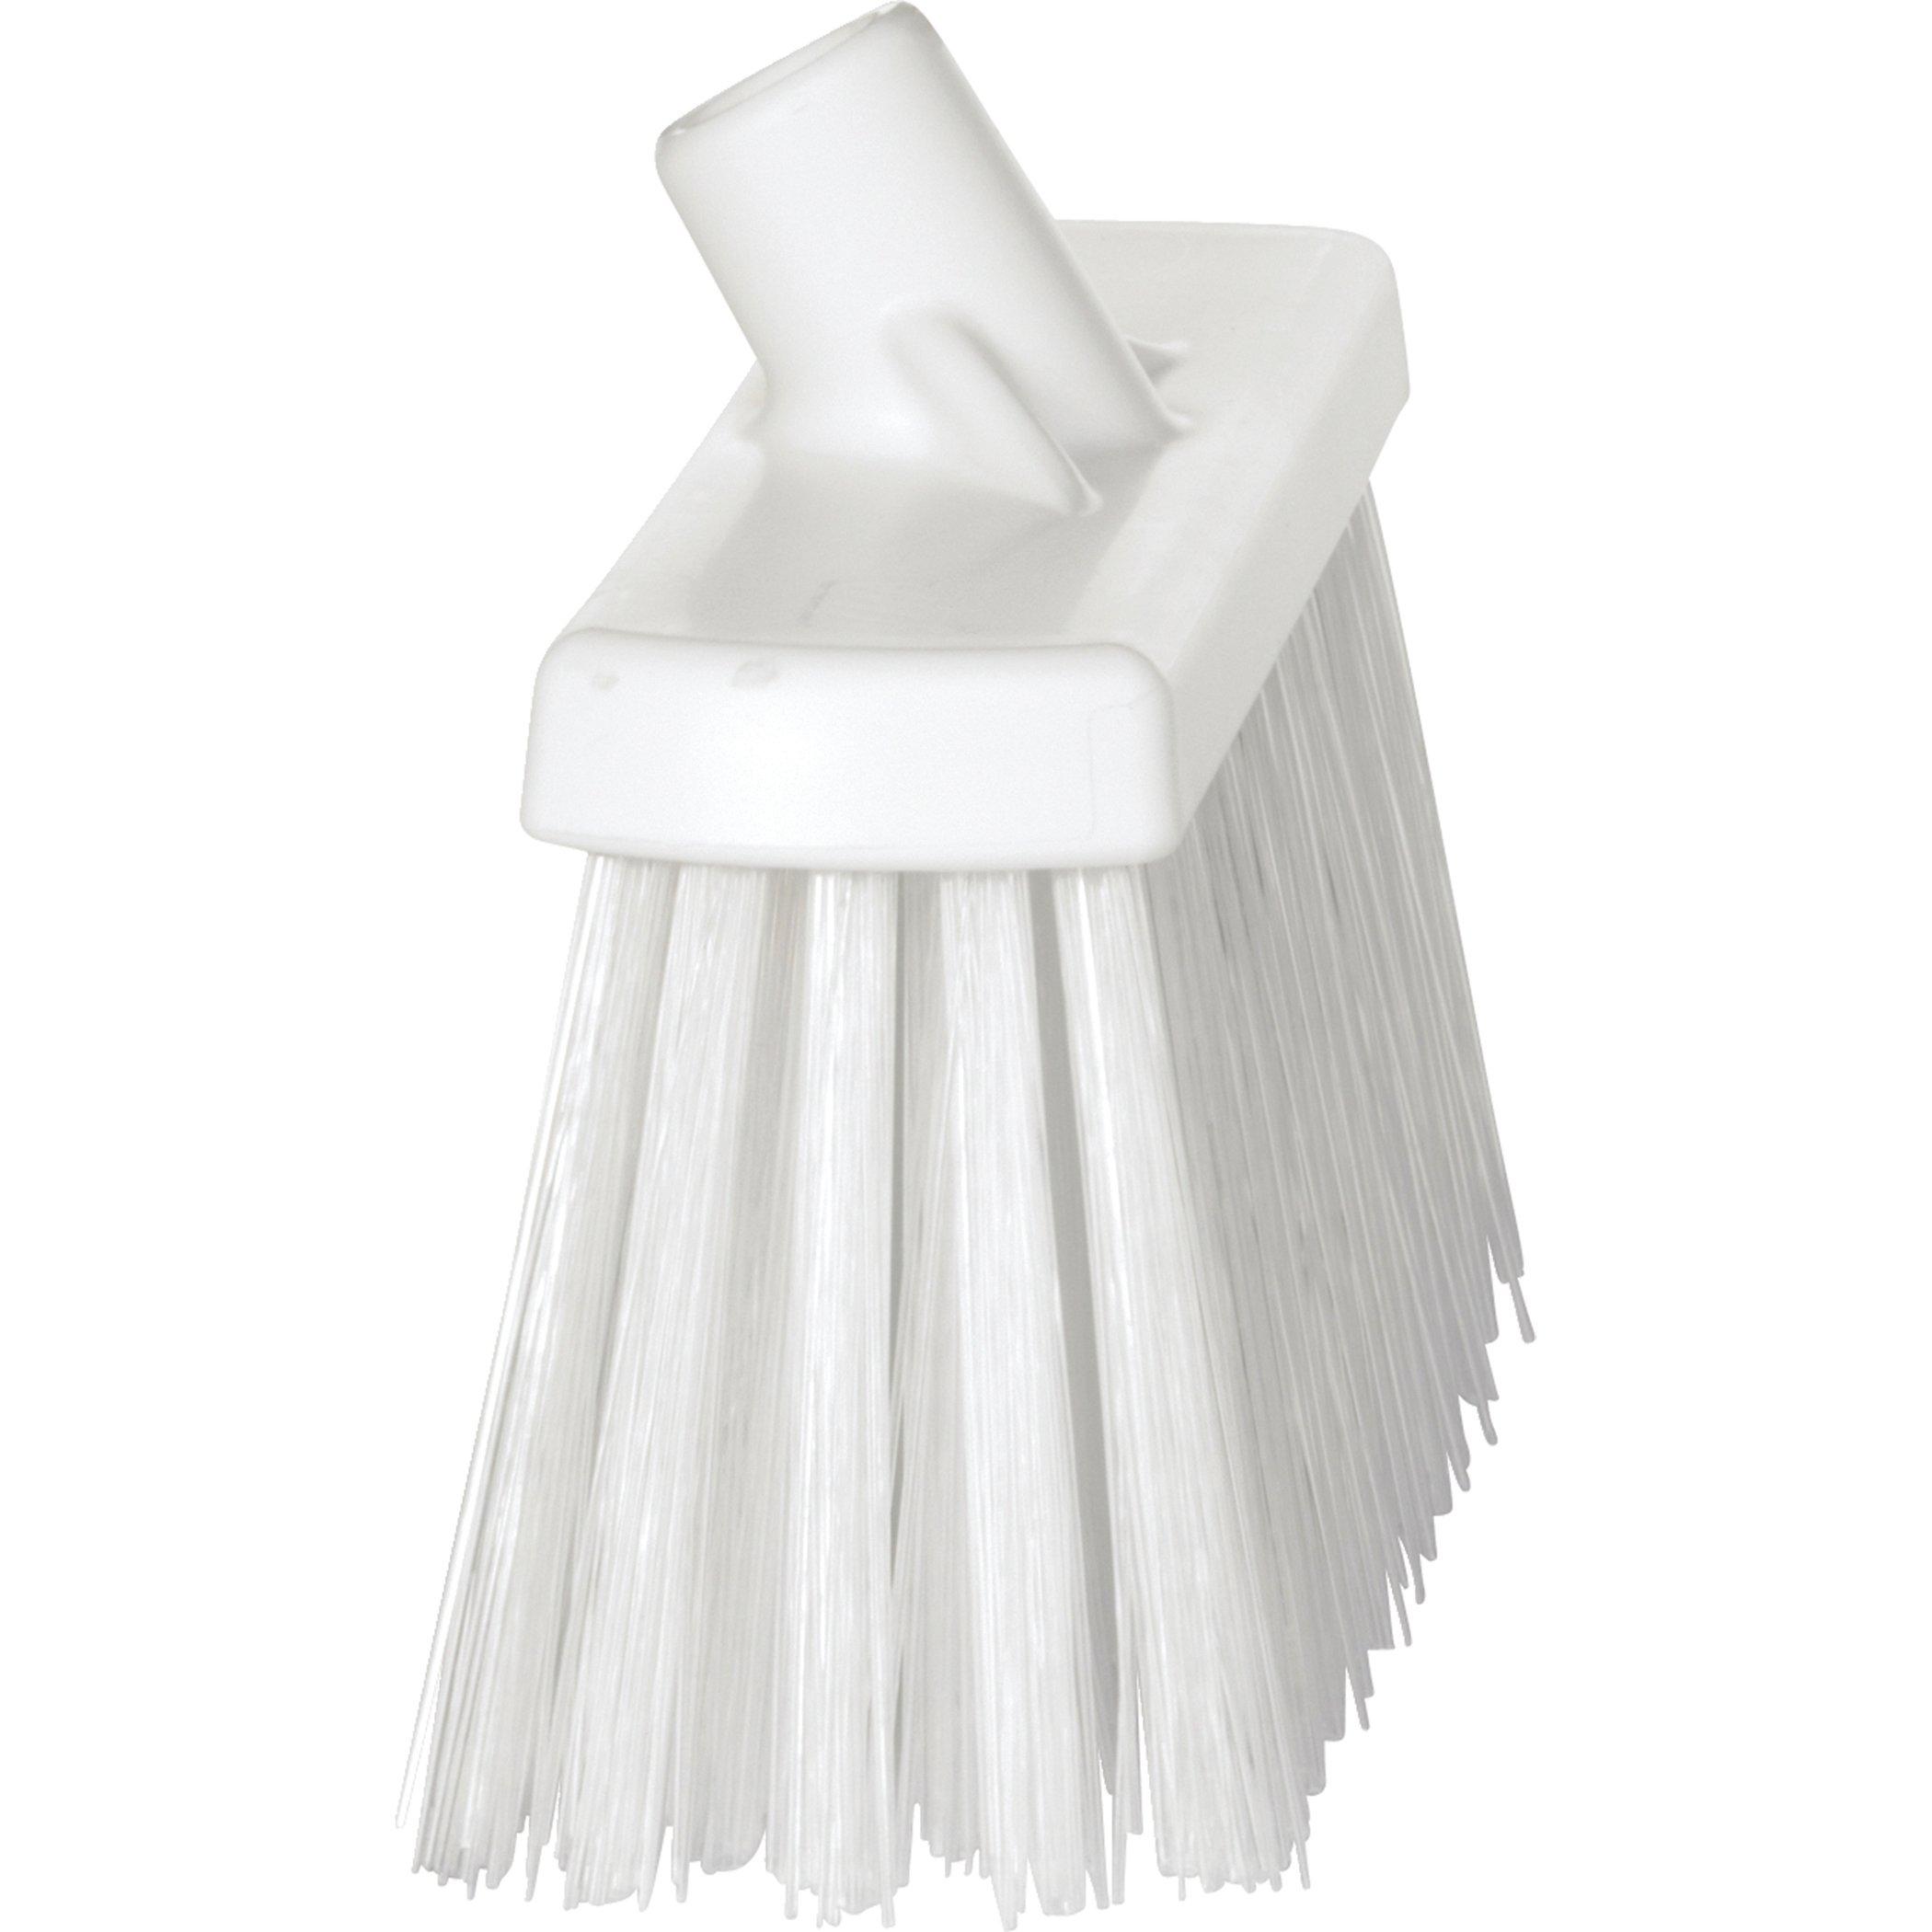 Vikan 29155 Heavy Duty Block Sweep Floor Broom Head, PET Bristle Polypropylene, 12-3/4'', White